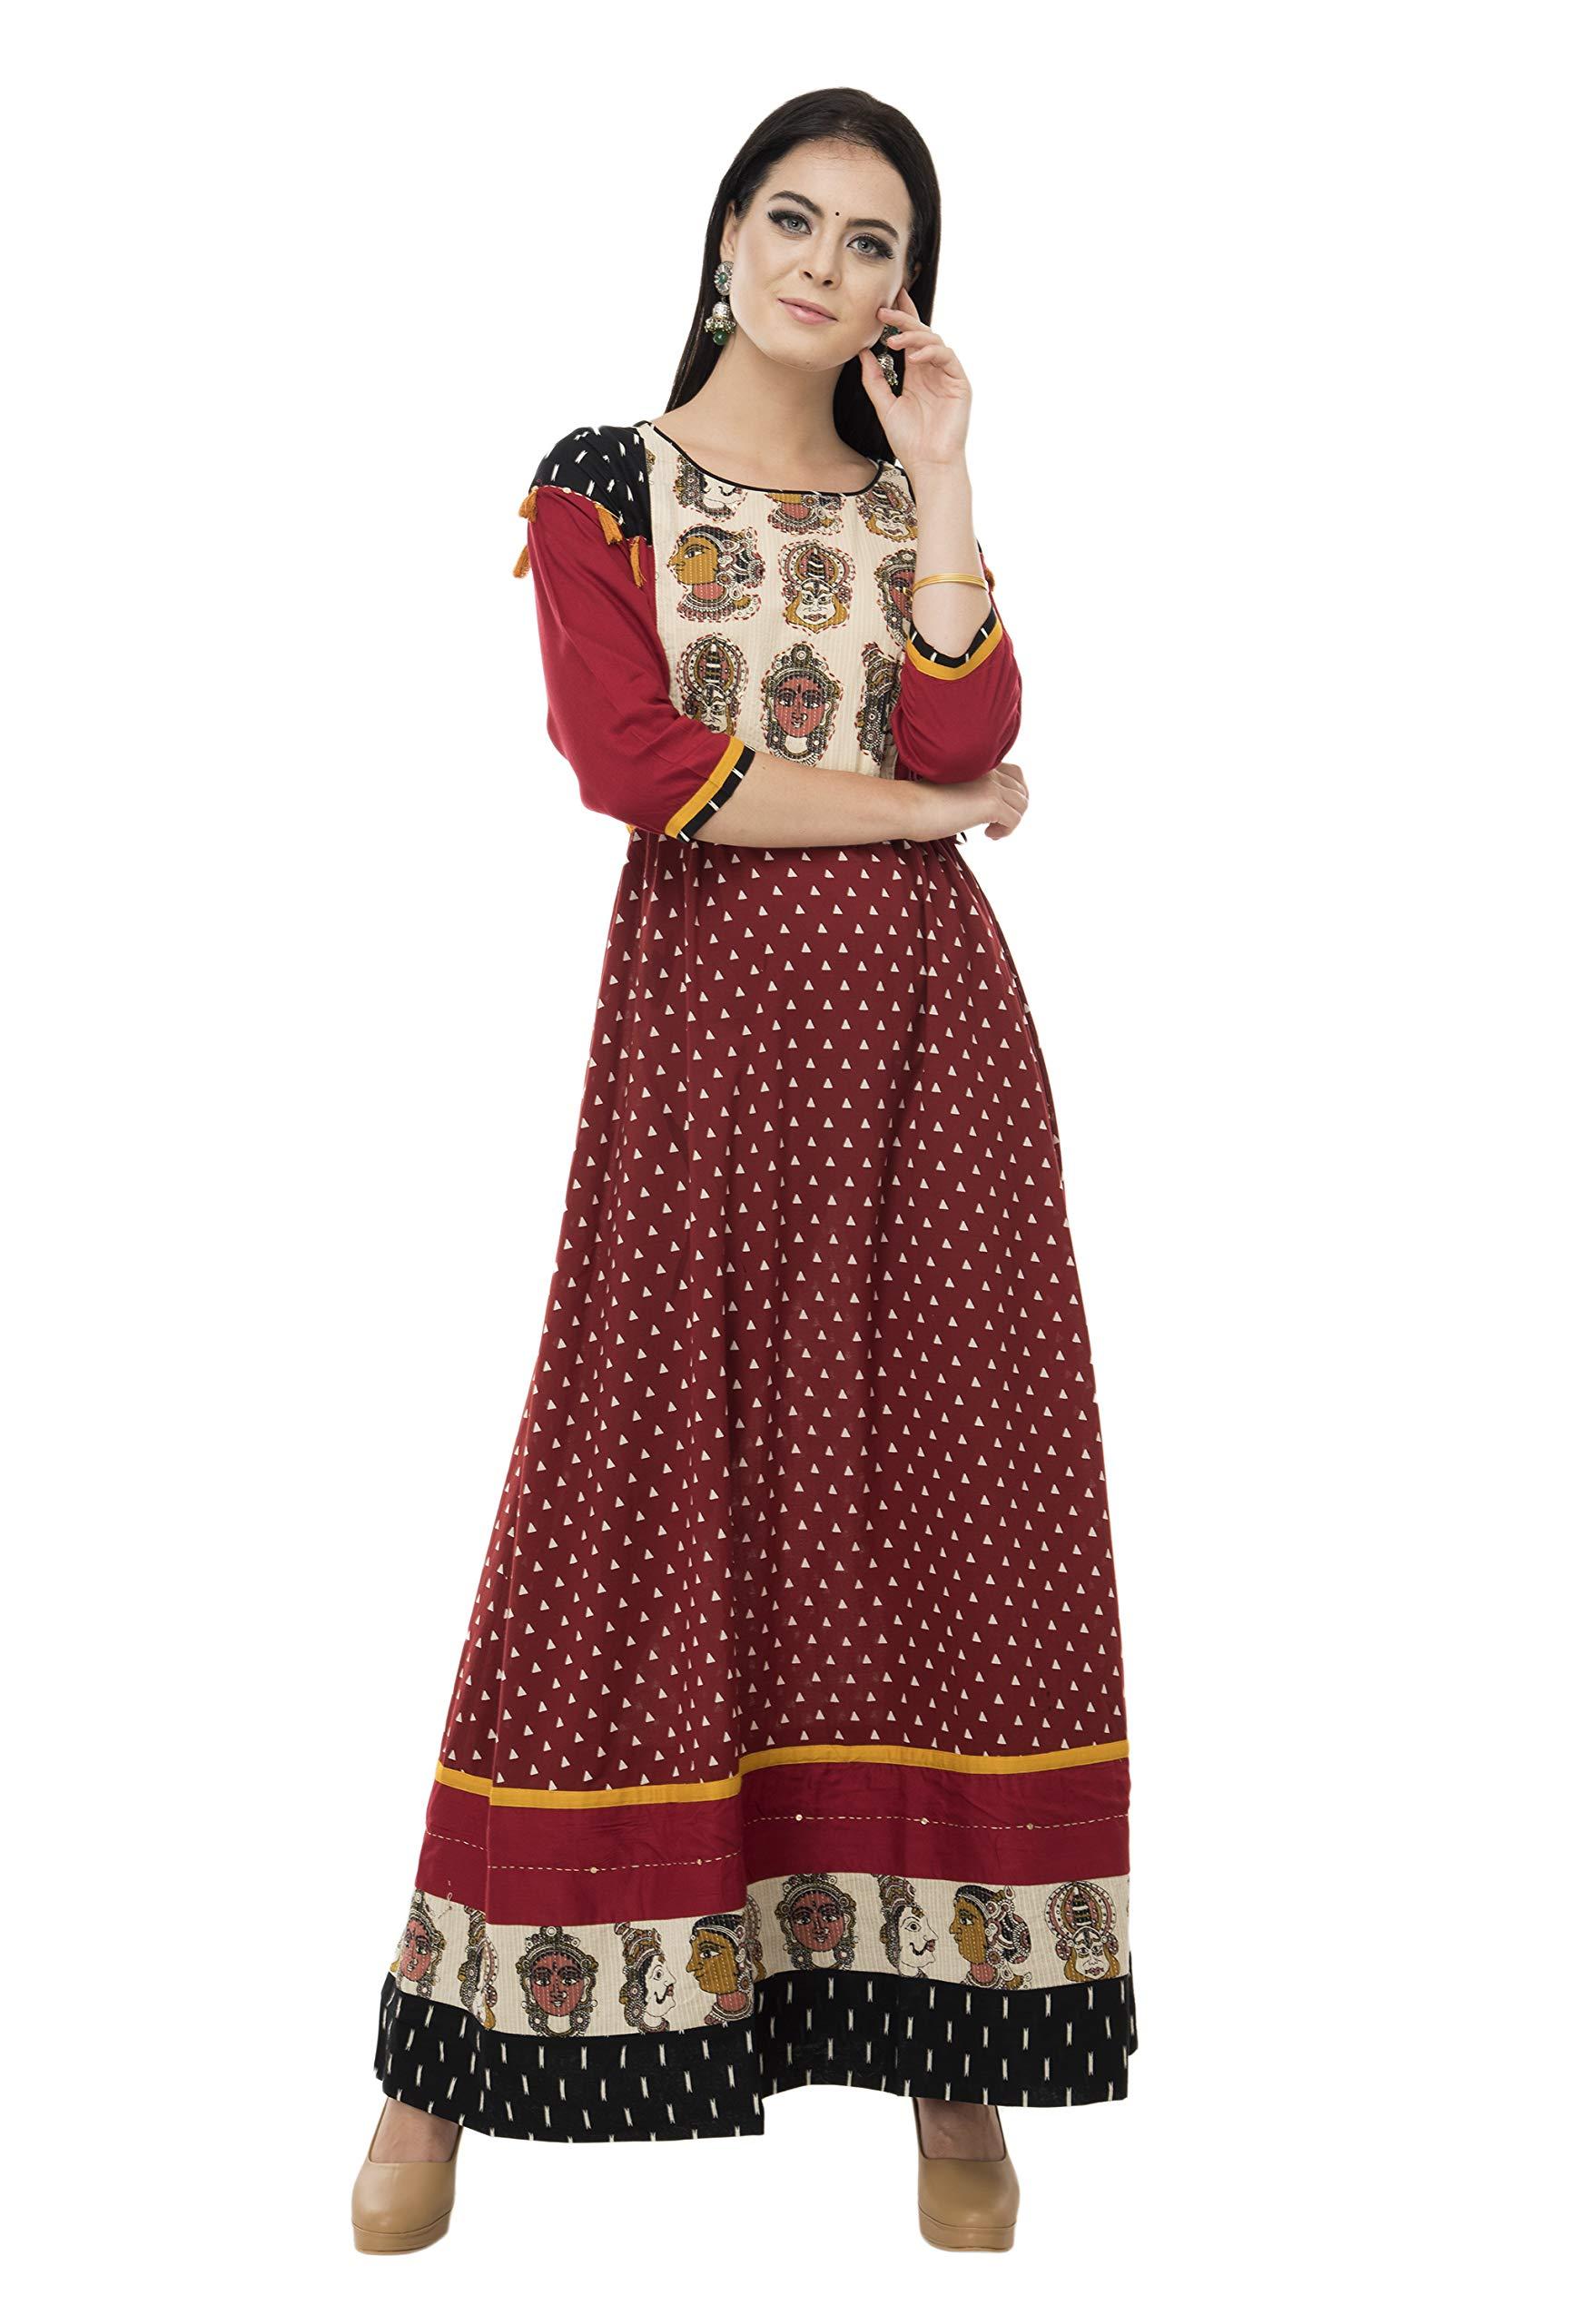 SABHYATA Womens Kurta Indian Kurtis for Women Cotton Casual Tunic Top Long Dress X-Large Black/Maroon